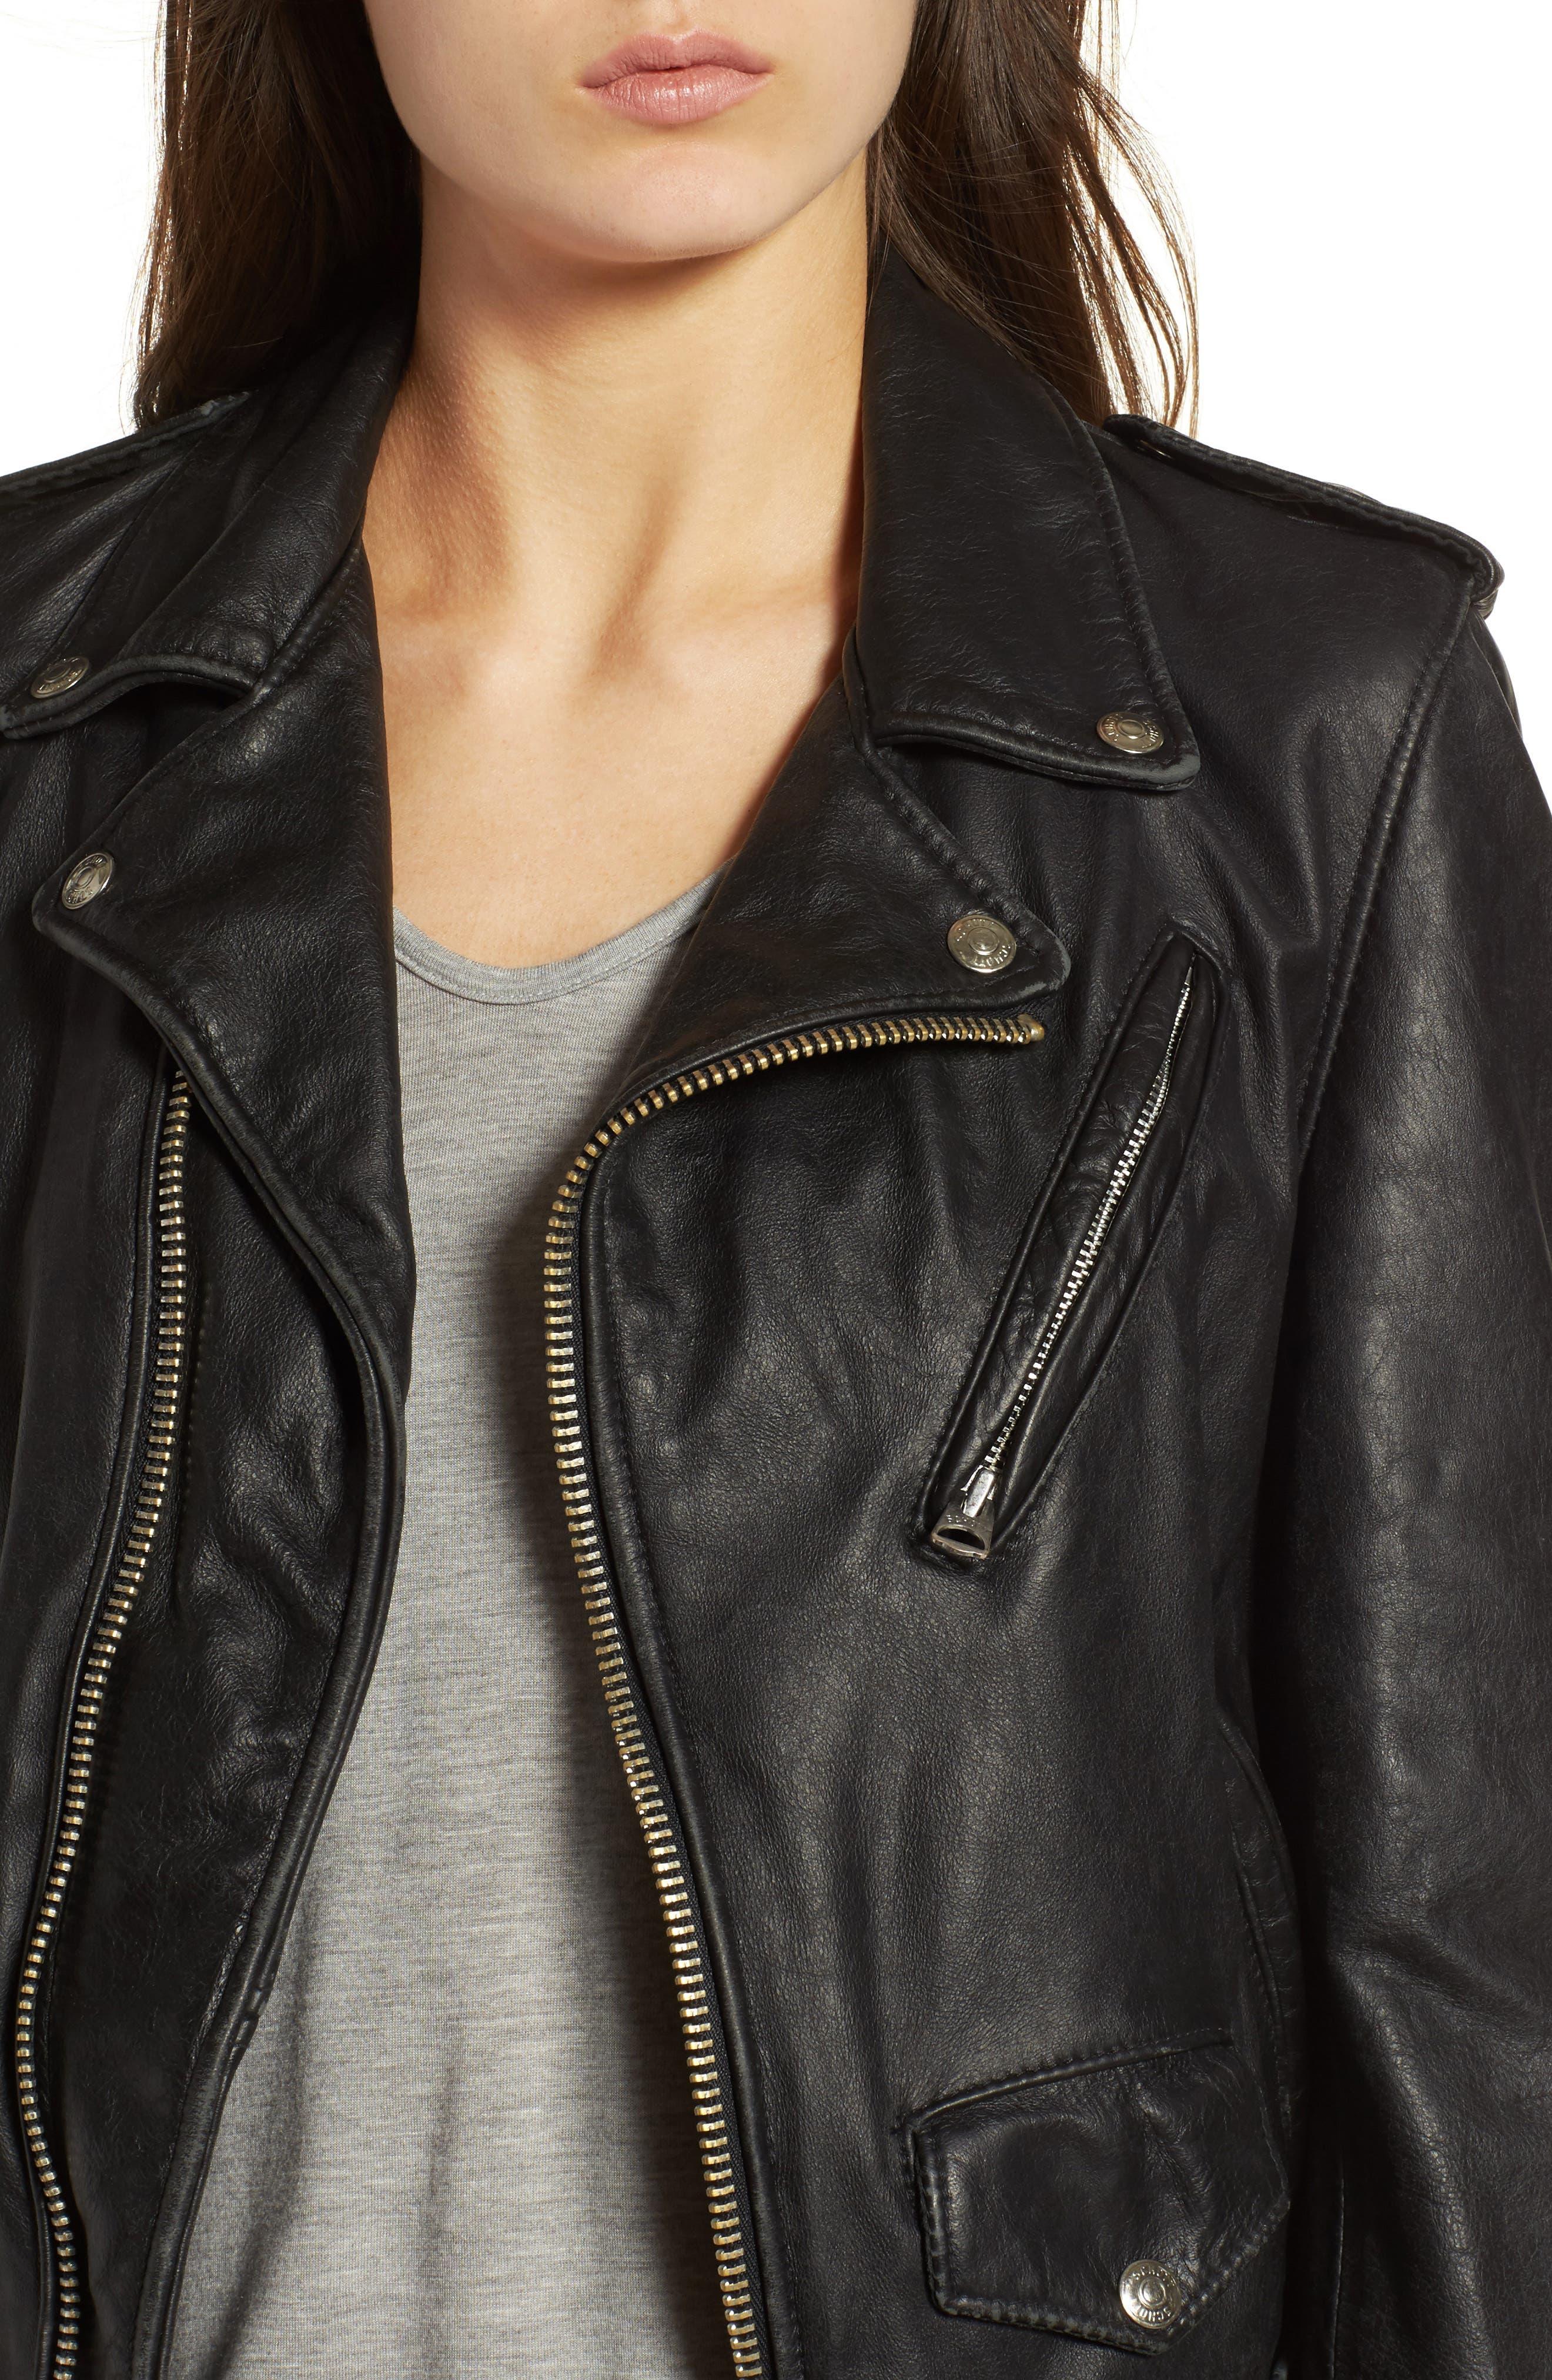 Boyfriend Leather Jacket,                             Alternate thumbnail 4, color,                             Black